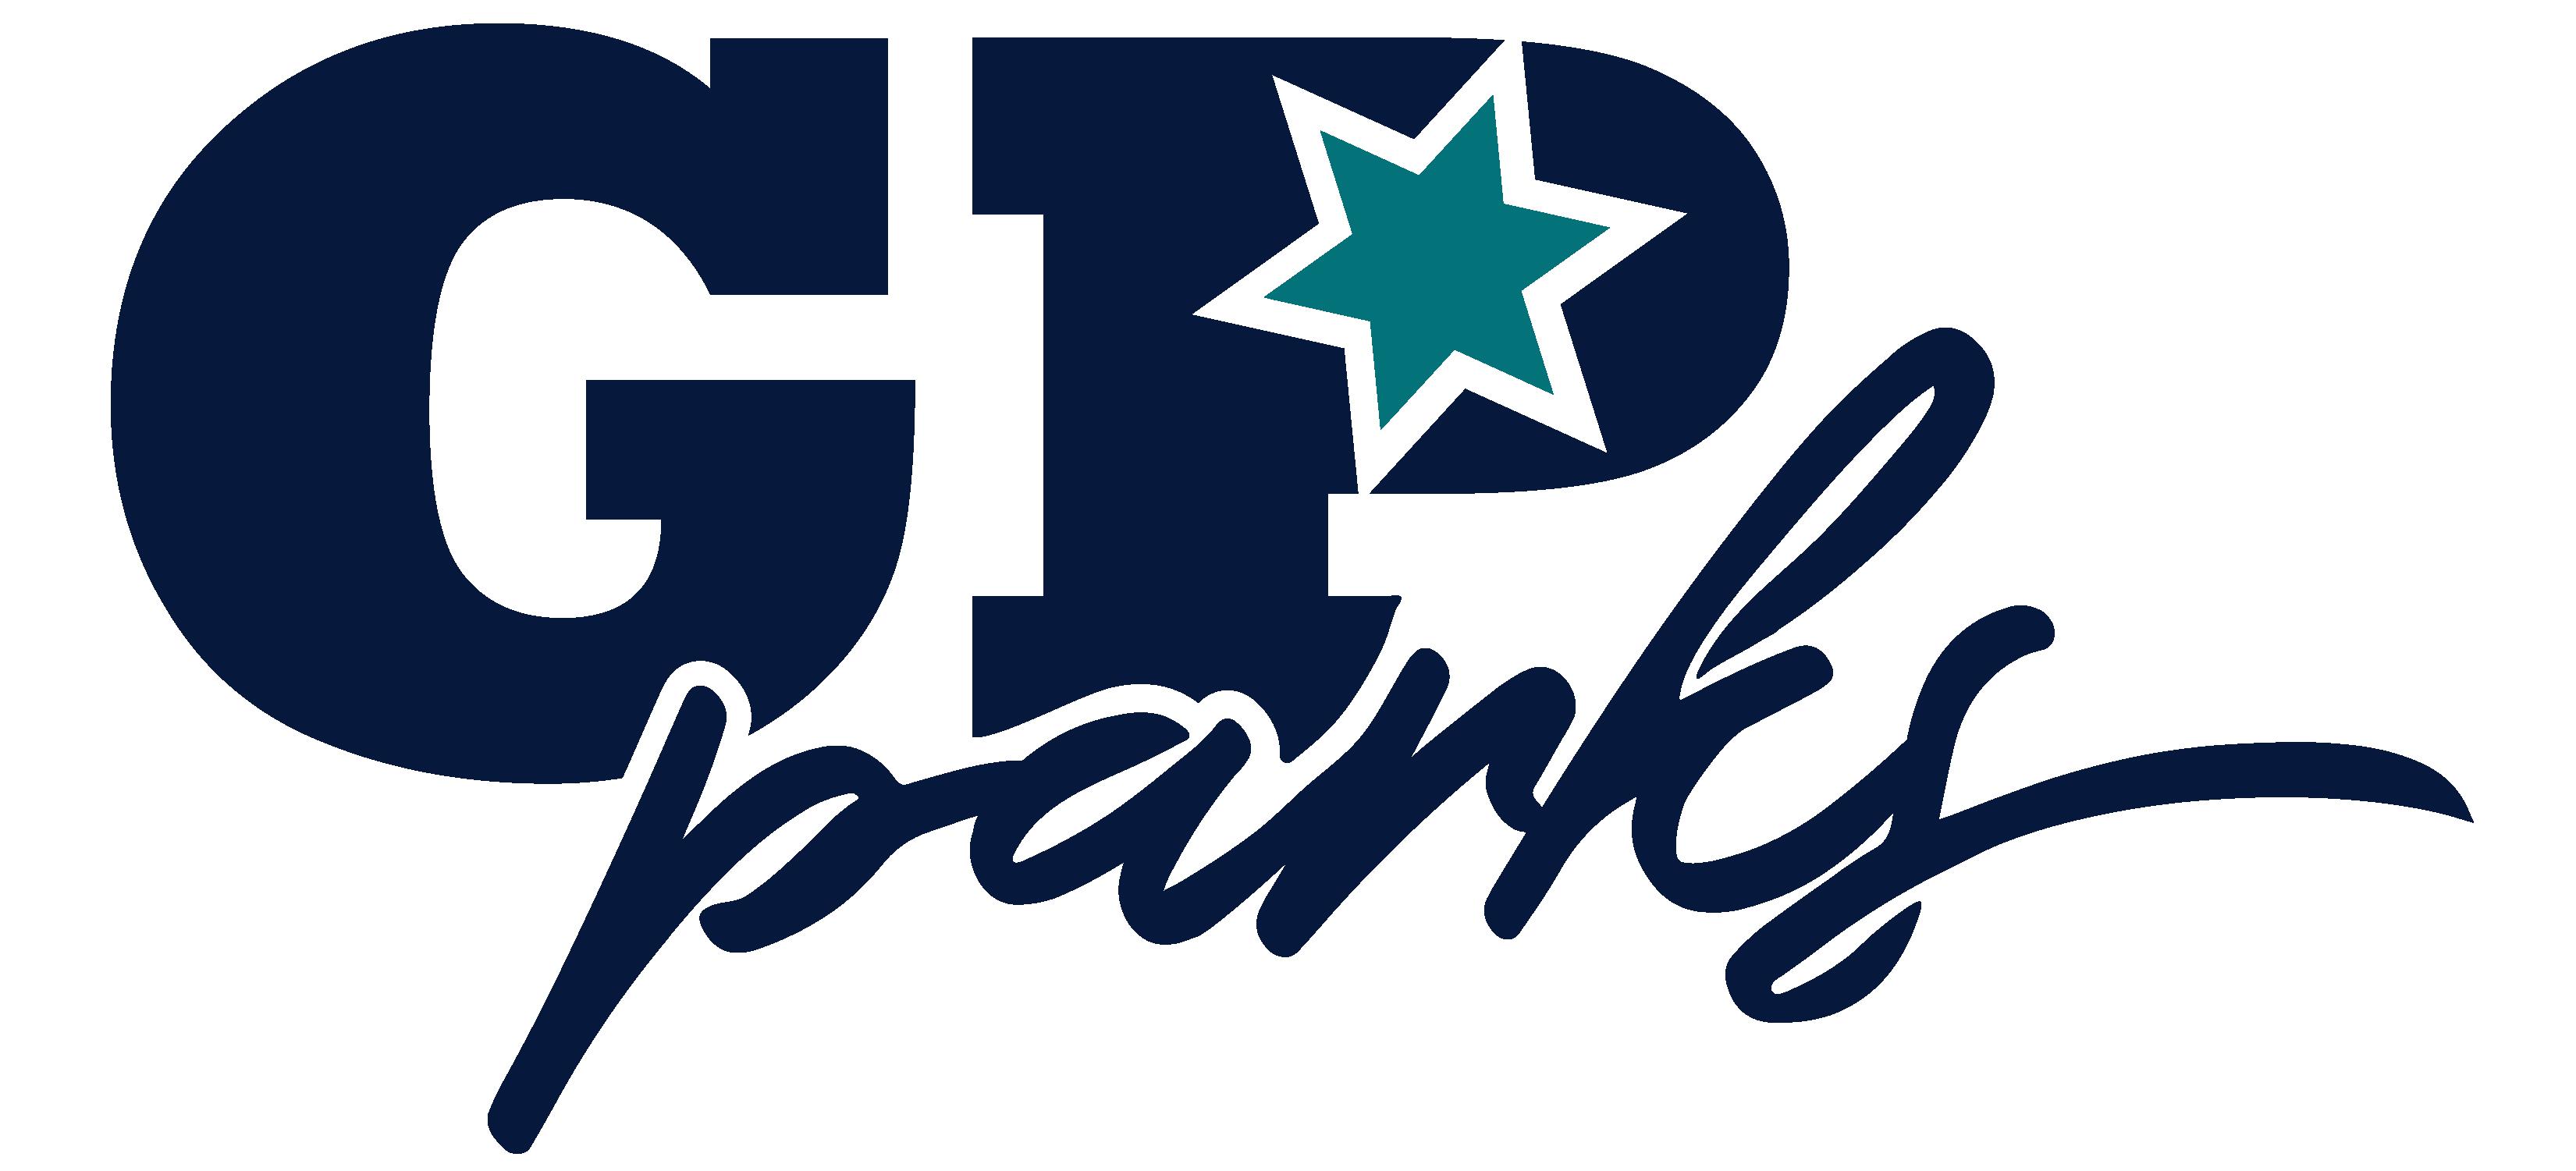 20200902_GPP_Logo_Primary_Blue-Teal_f1 (1)